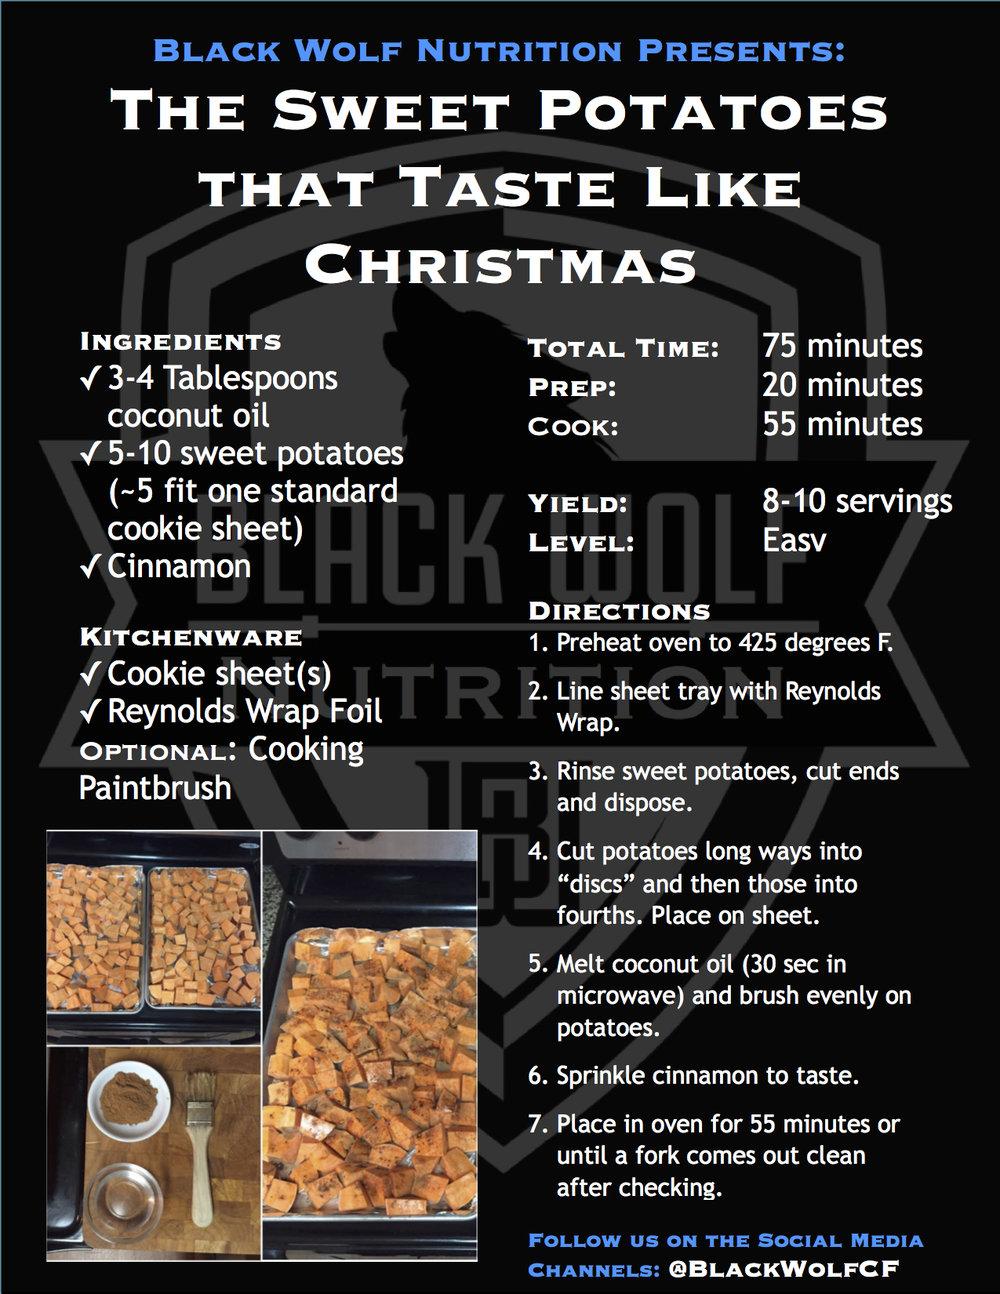 BW Nutrition Recipes Sweet Potato Christmas.jpg